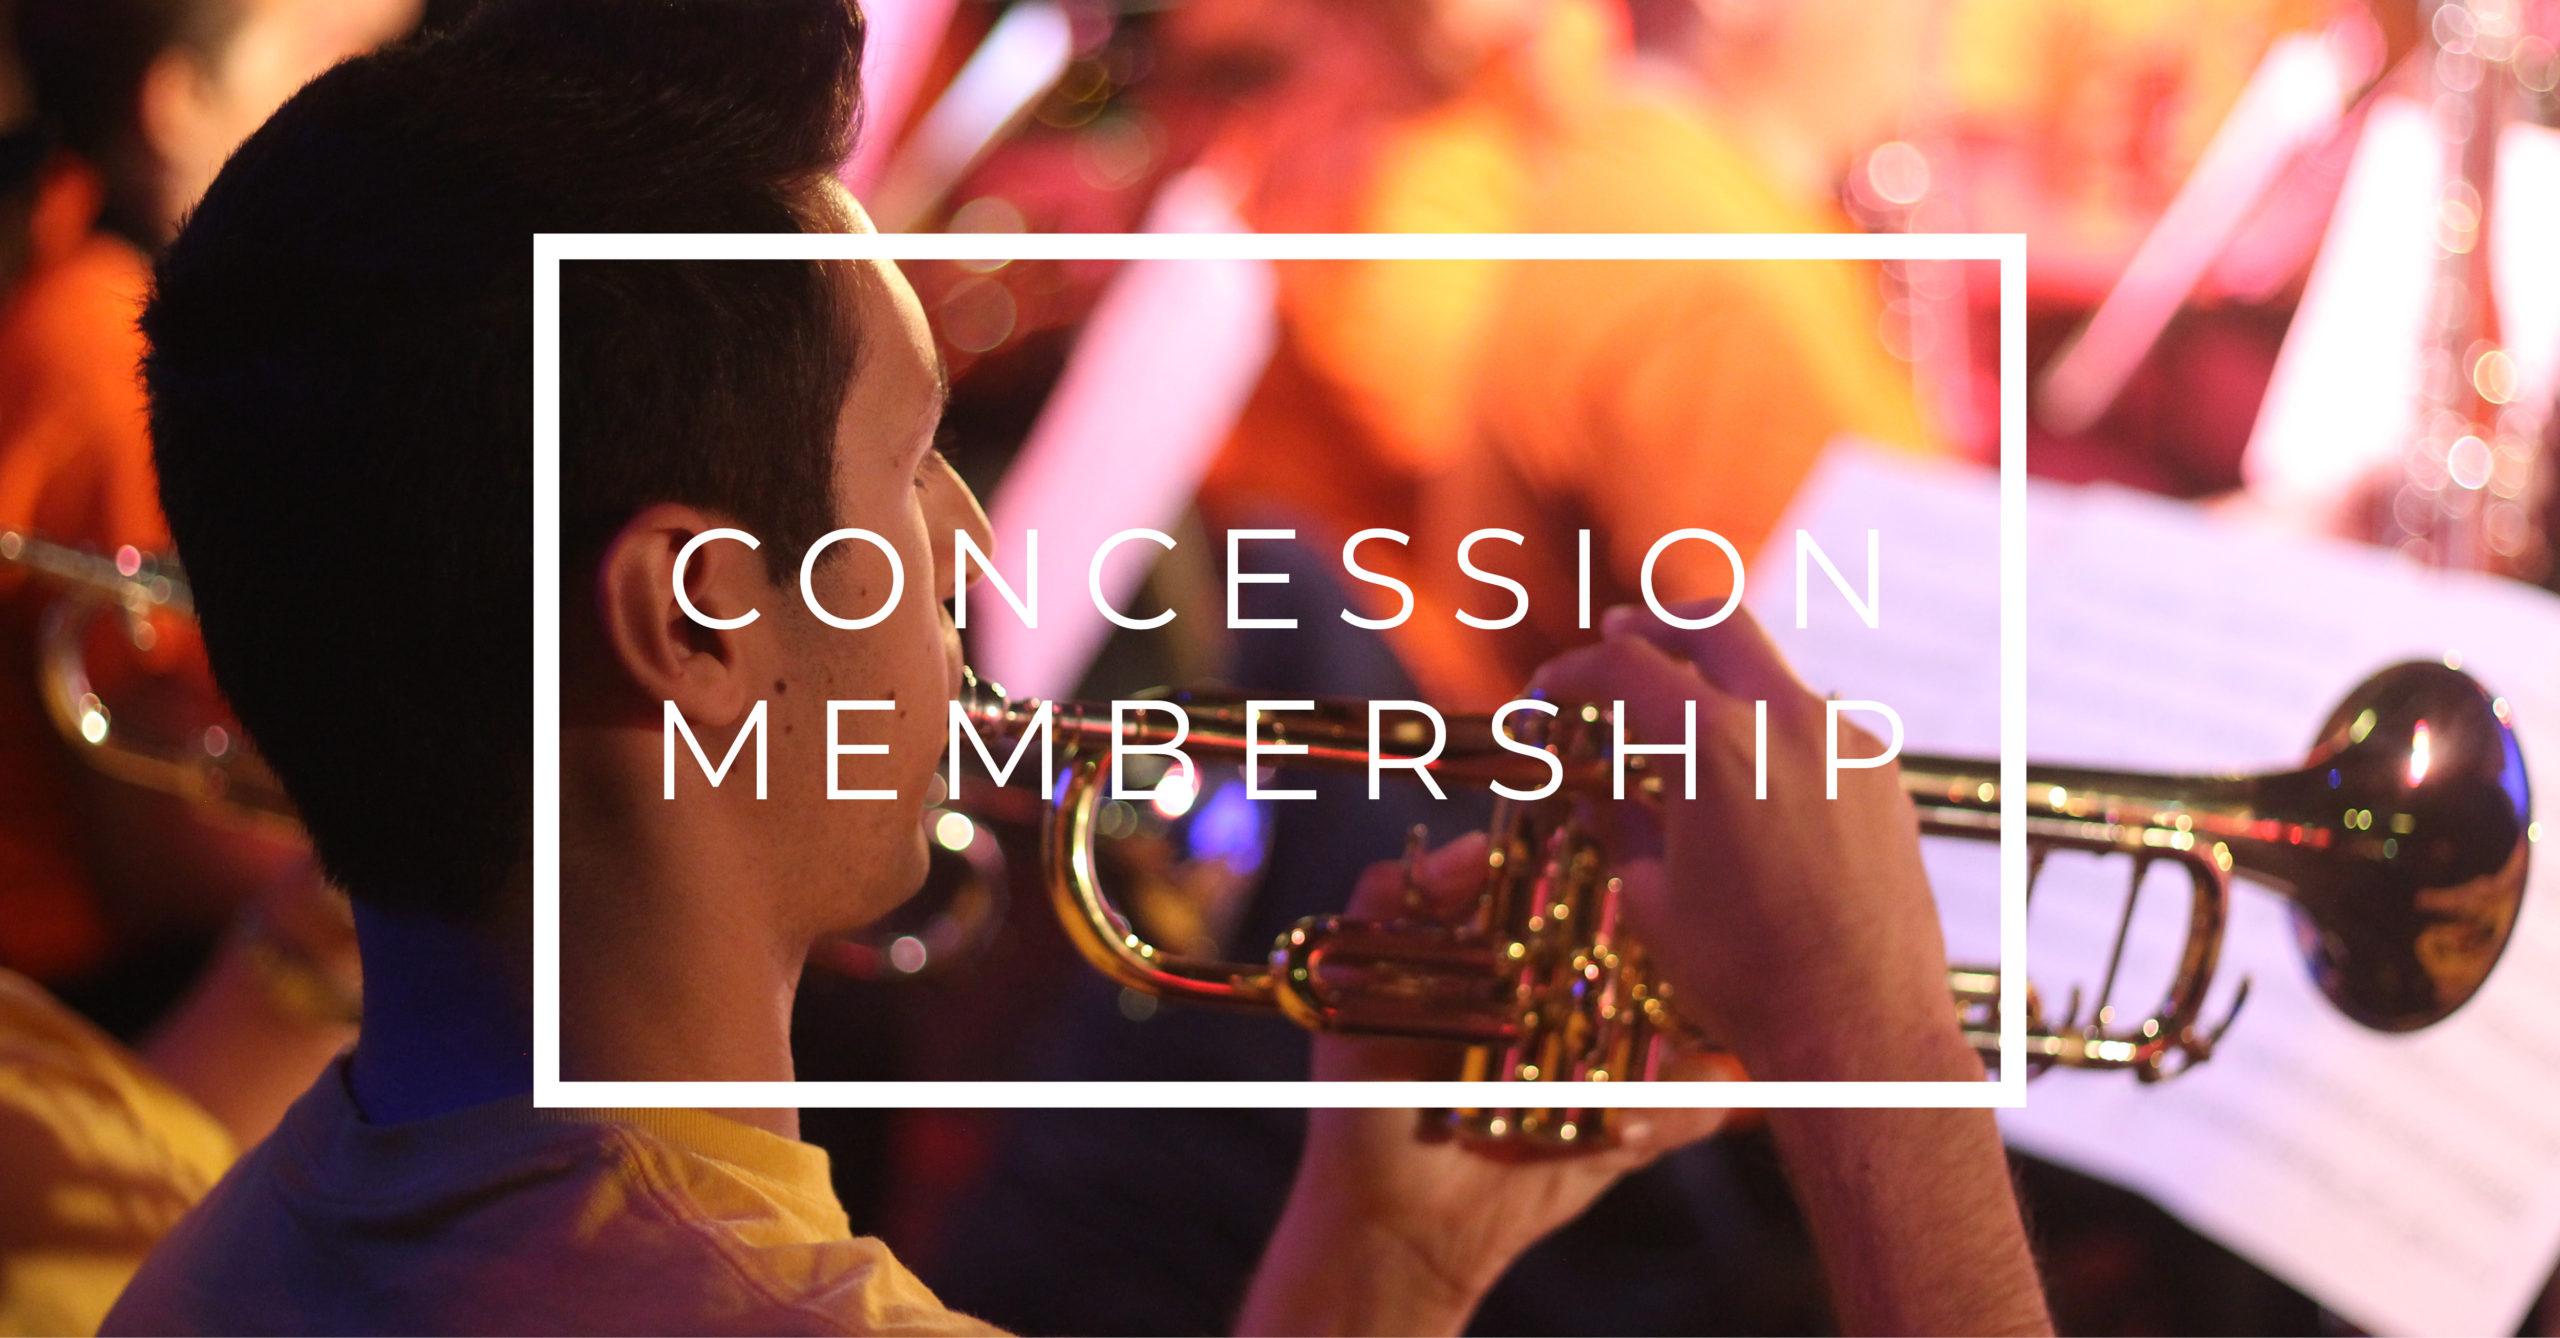 Rusty Membership – Concession